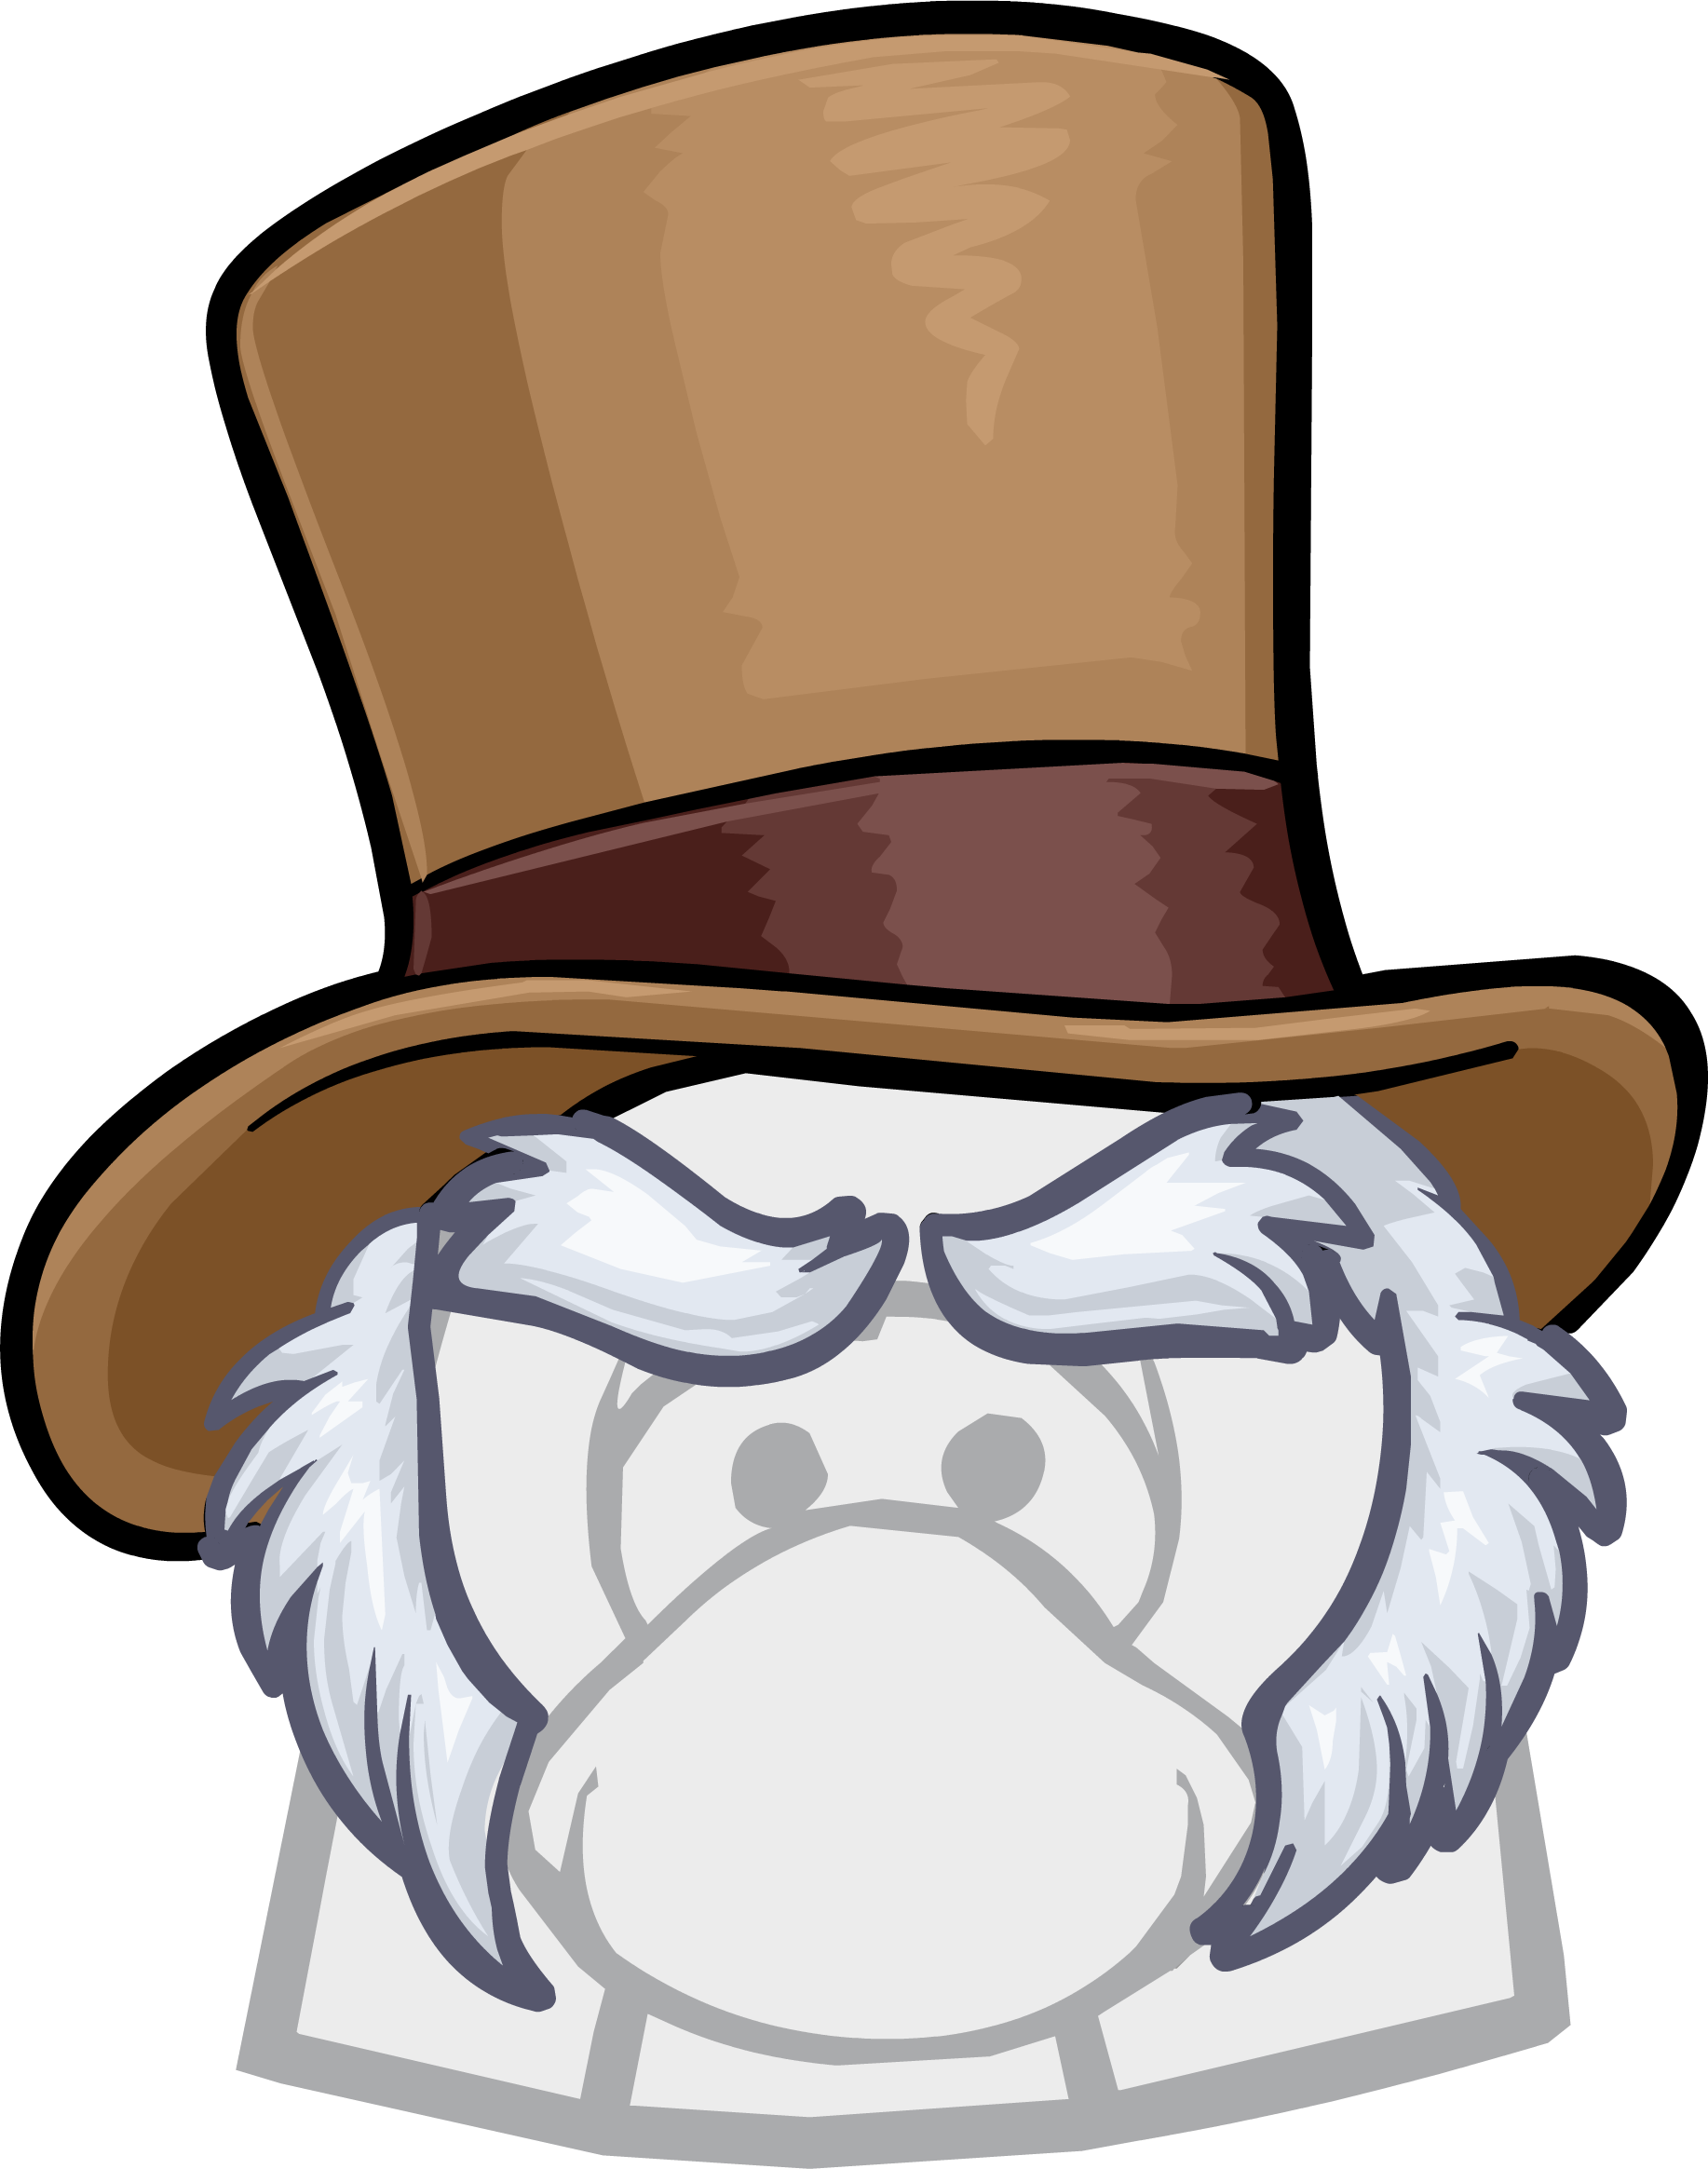 Humbug club penguin wiki. Fedora clipart press hat